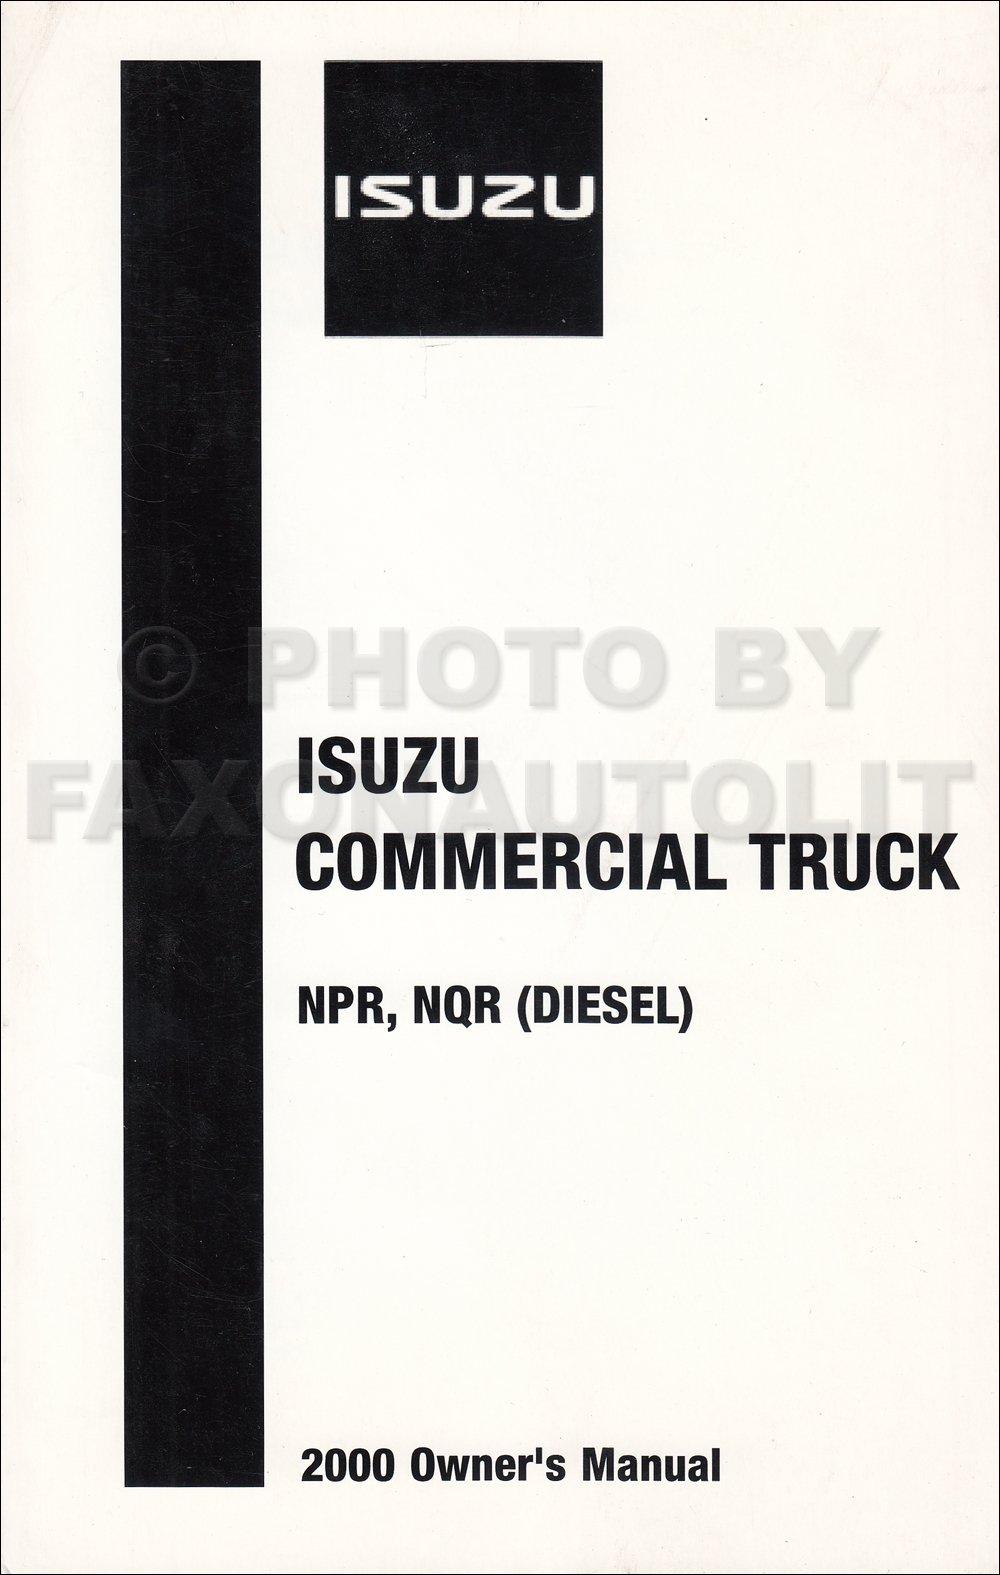 isuzu npr nqr diesel 2000 commercial truck owners manual isuzu rh amazon  com isuzu nqr service manual pdf 2010 isuzu nqr owners manual